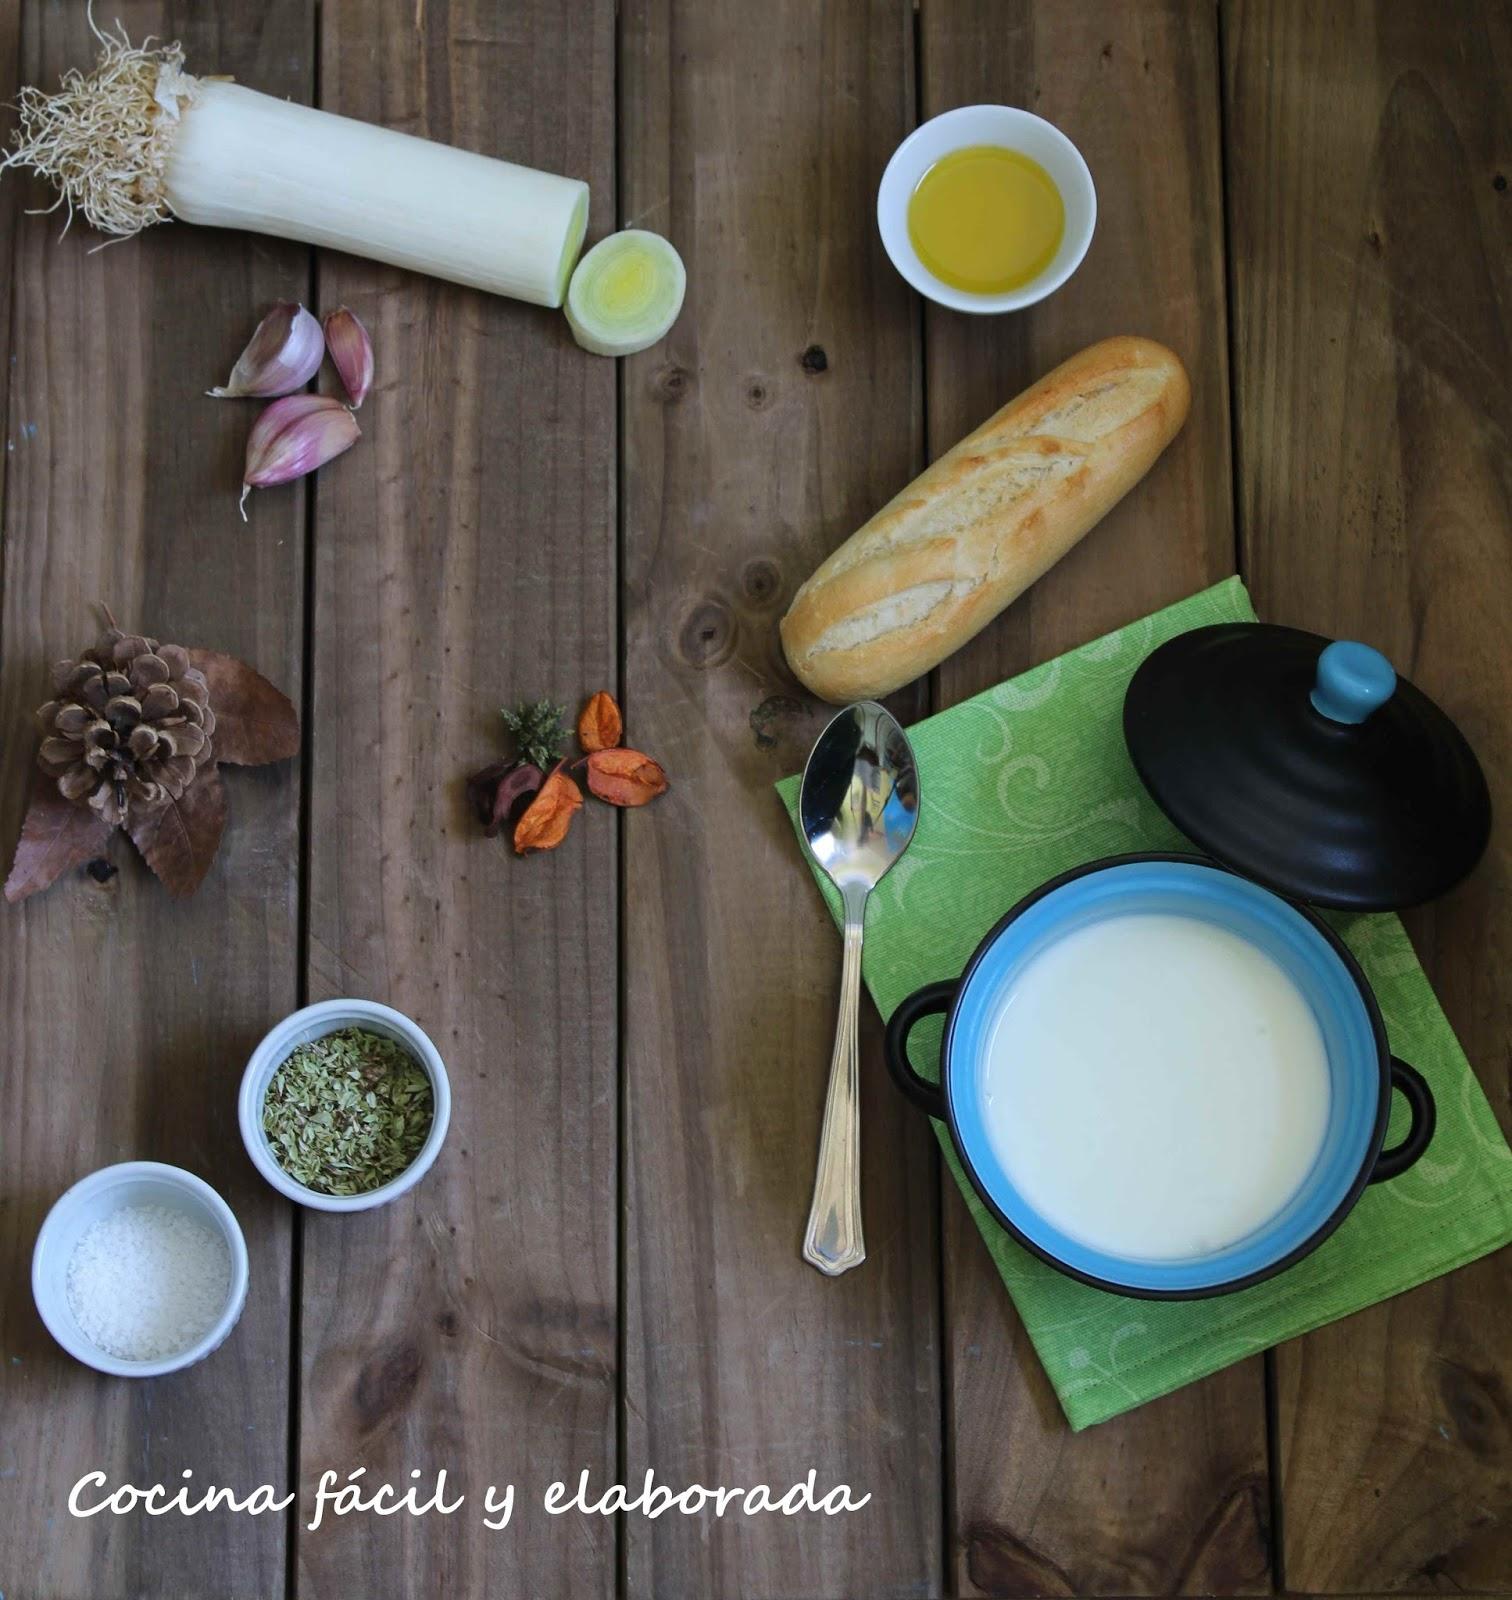 Cocina facil y elaborada vichyssoise crema fria de puerros for Sopas francesas famosas